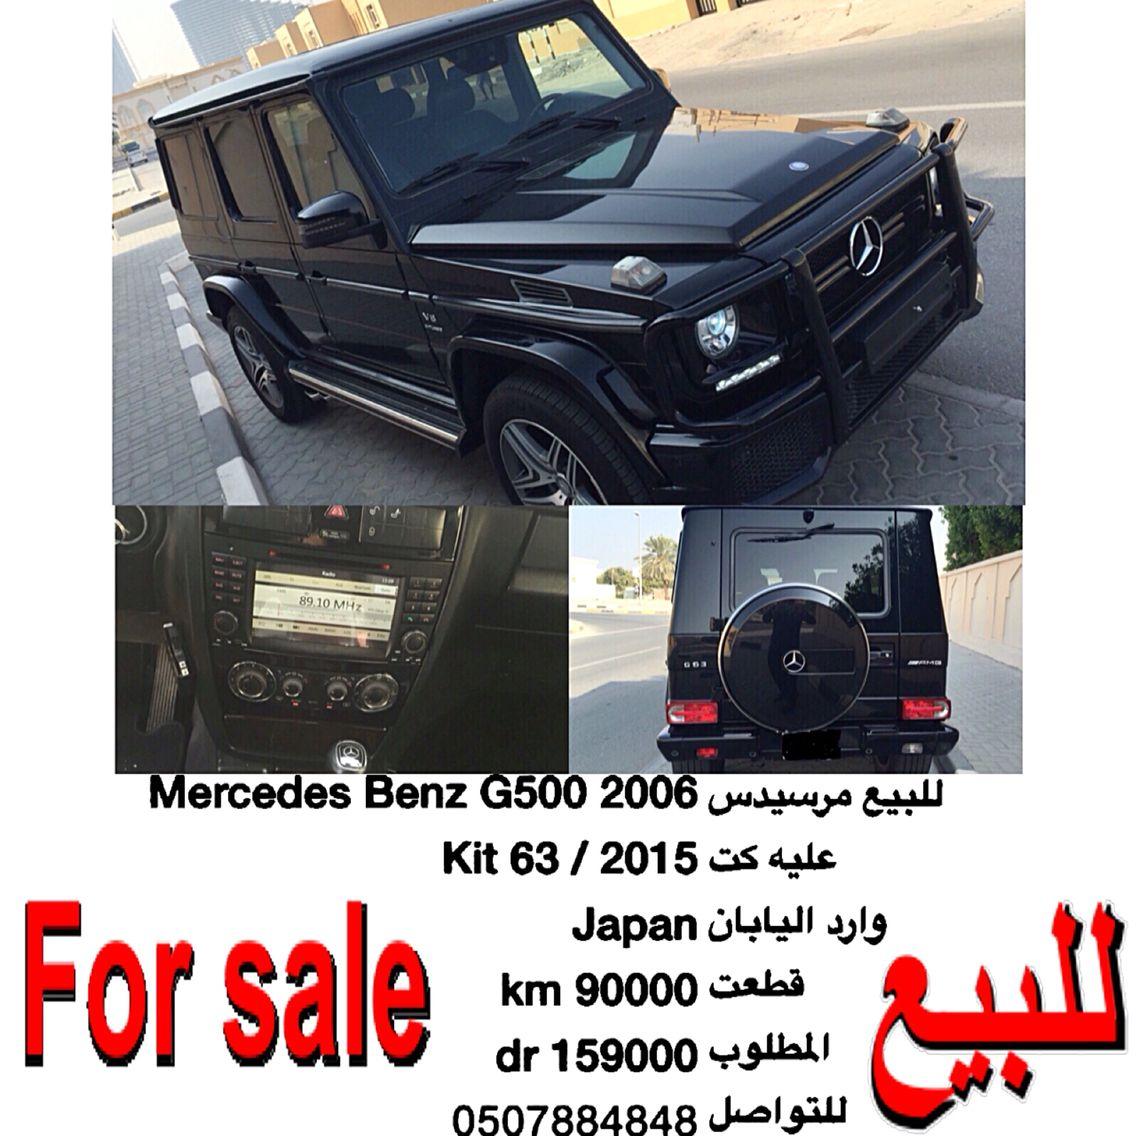 للبيع مرسيدس Mercedes Benz G500 2006 Kit 63 2015 Japan 90000 Km 159000 Dr 0507884848 اعلانvip واتساب انستقرام Uae4cars2 Mercedes Benz G500 Benz G500 Benz